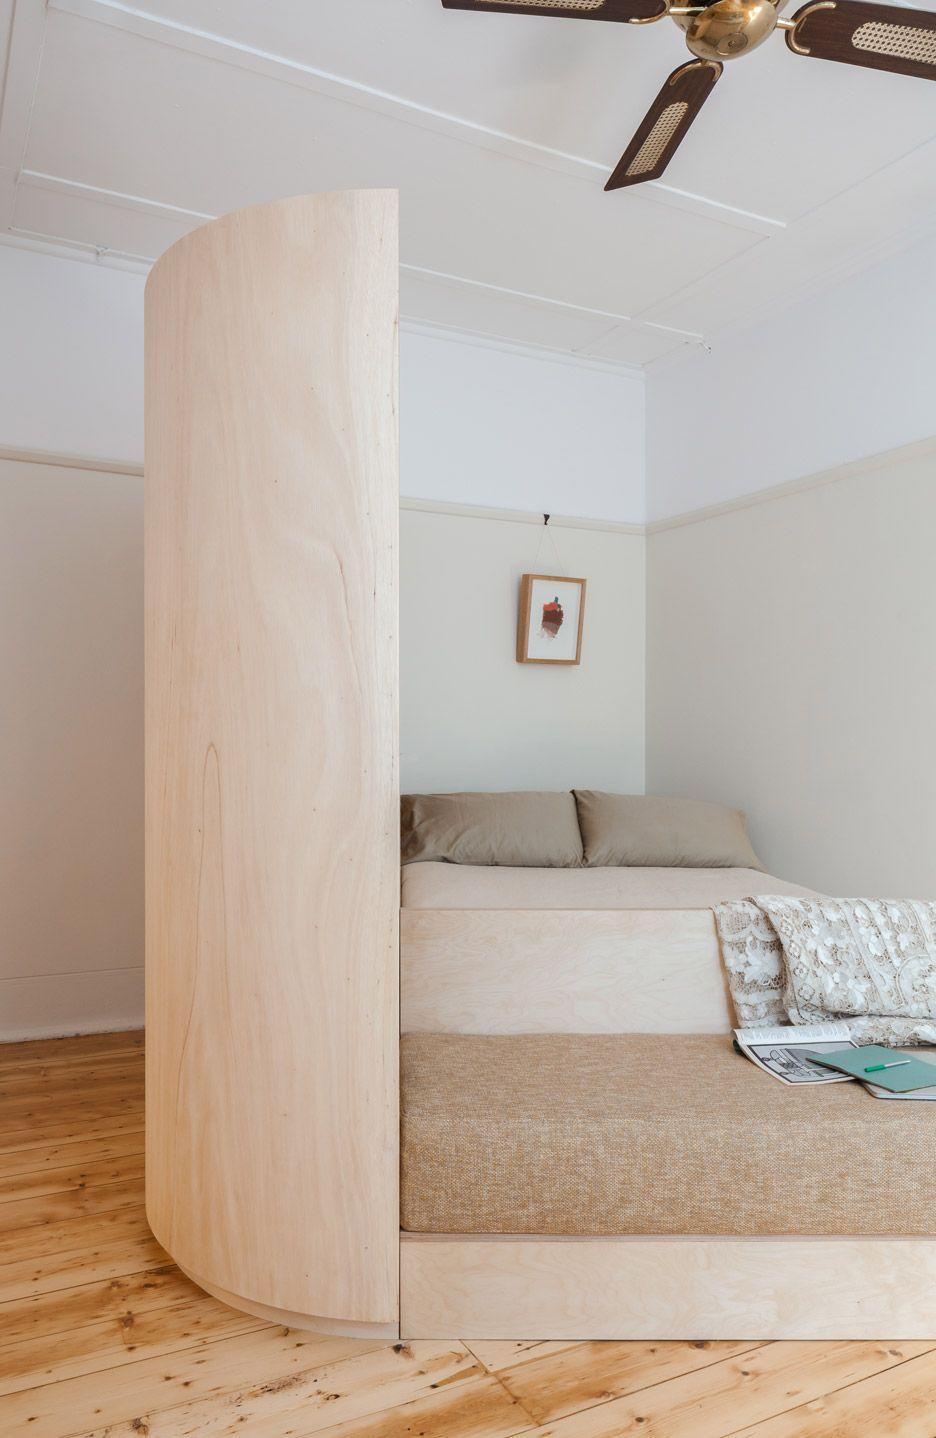 All In One Storage Unit Creates Cozy Nook In Adorable Australia Flat Apartment Renovation Furniture Design Home Decor